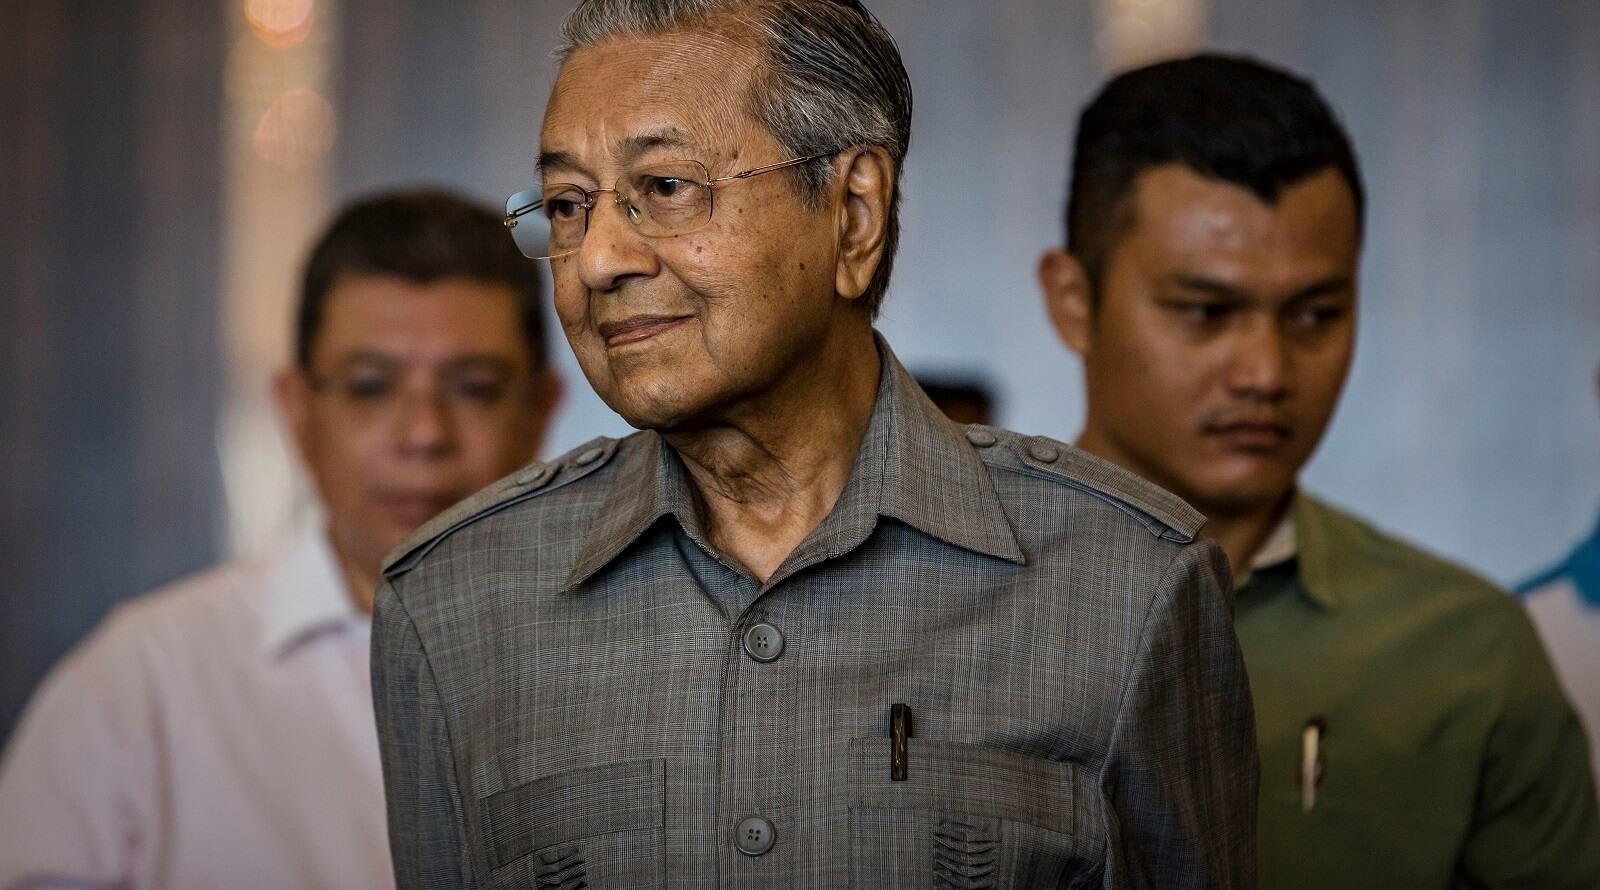 Malaysian Prime Minister Mahathir Mohamad, 10 May 2018 (Photo: Ulet Ifansasti/Getty)